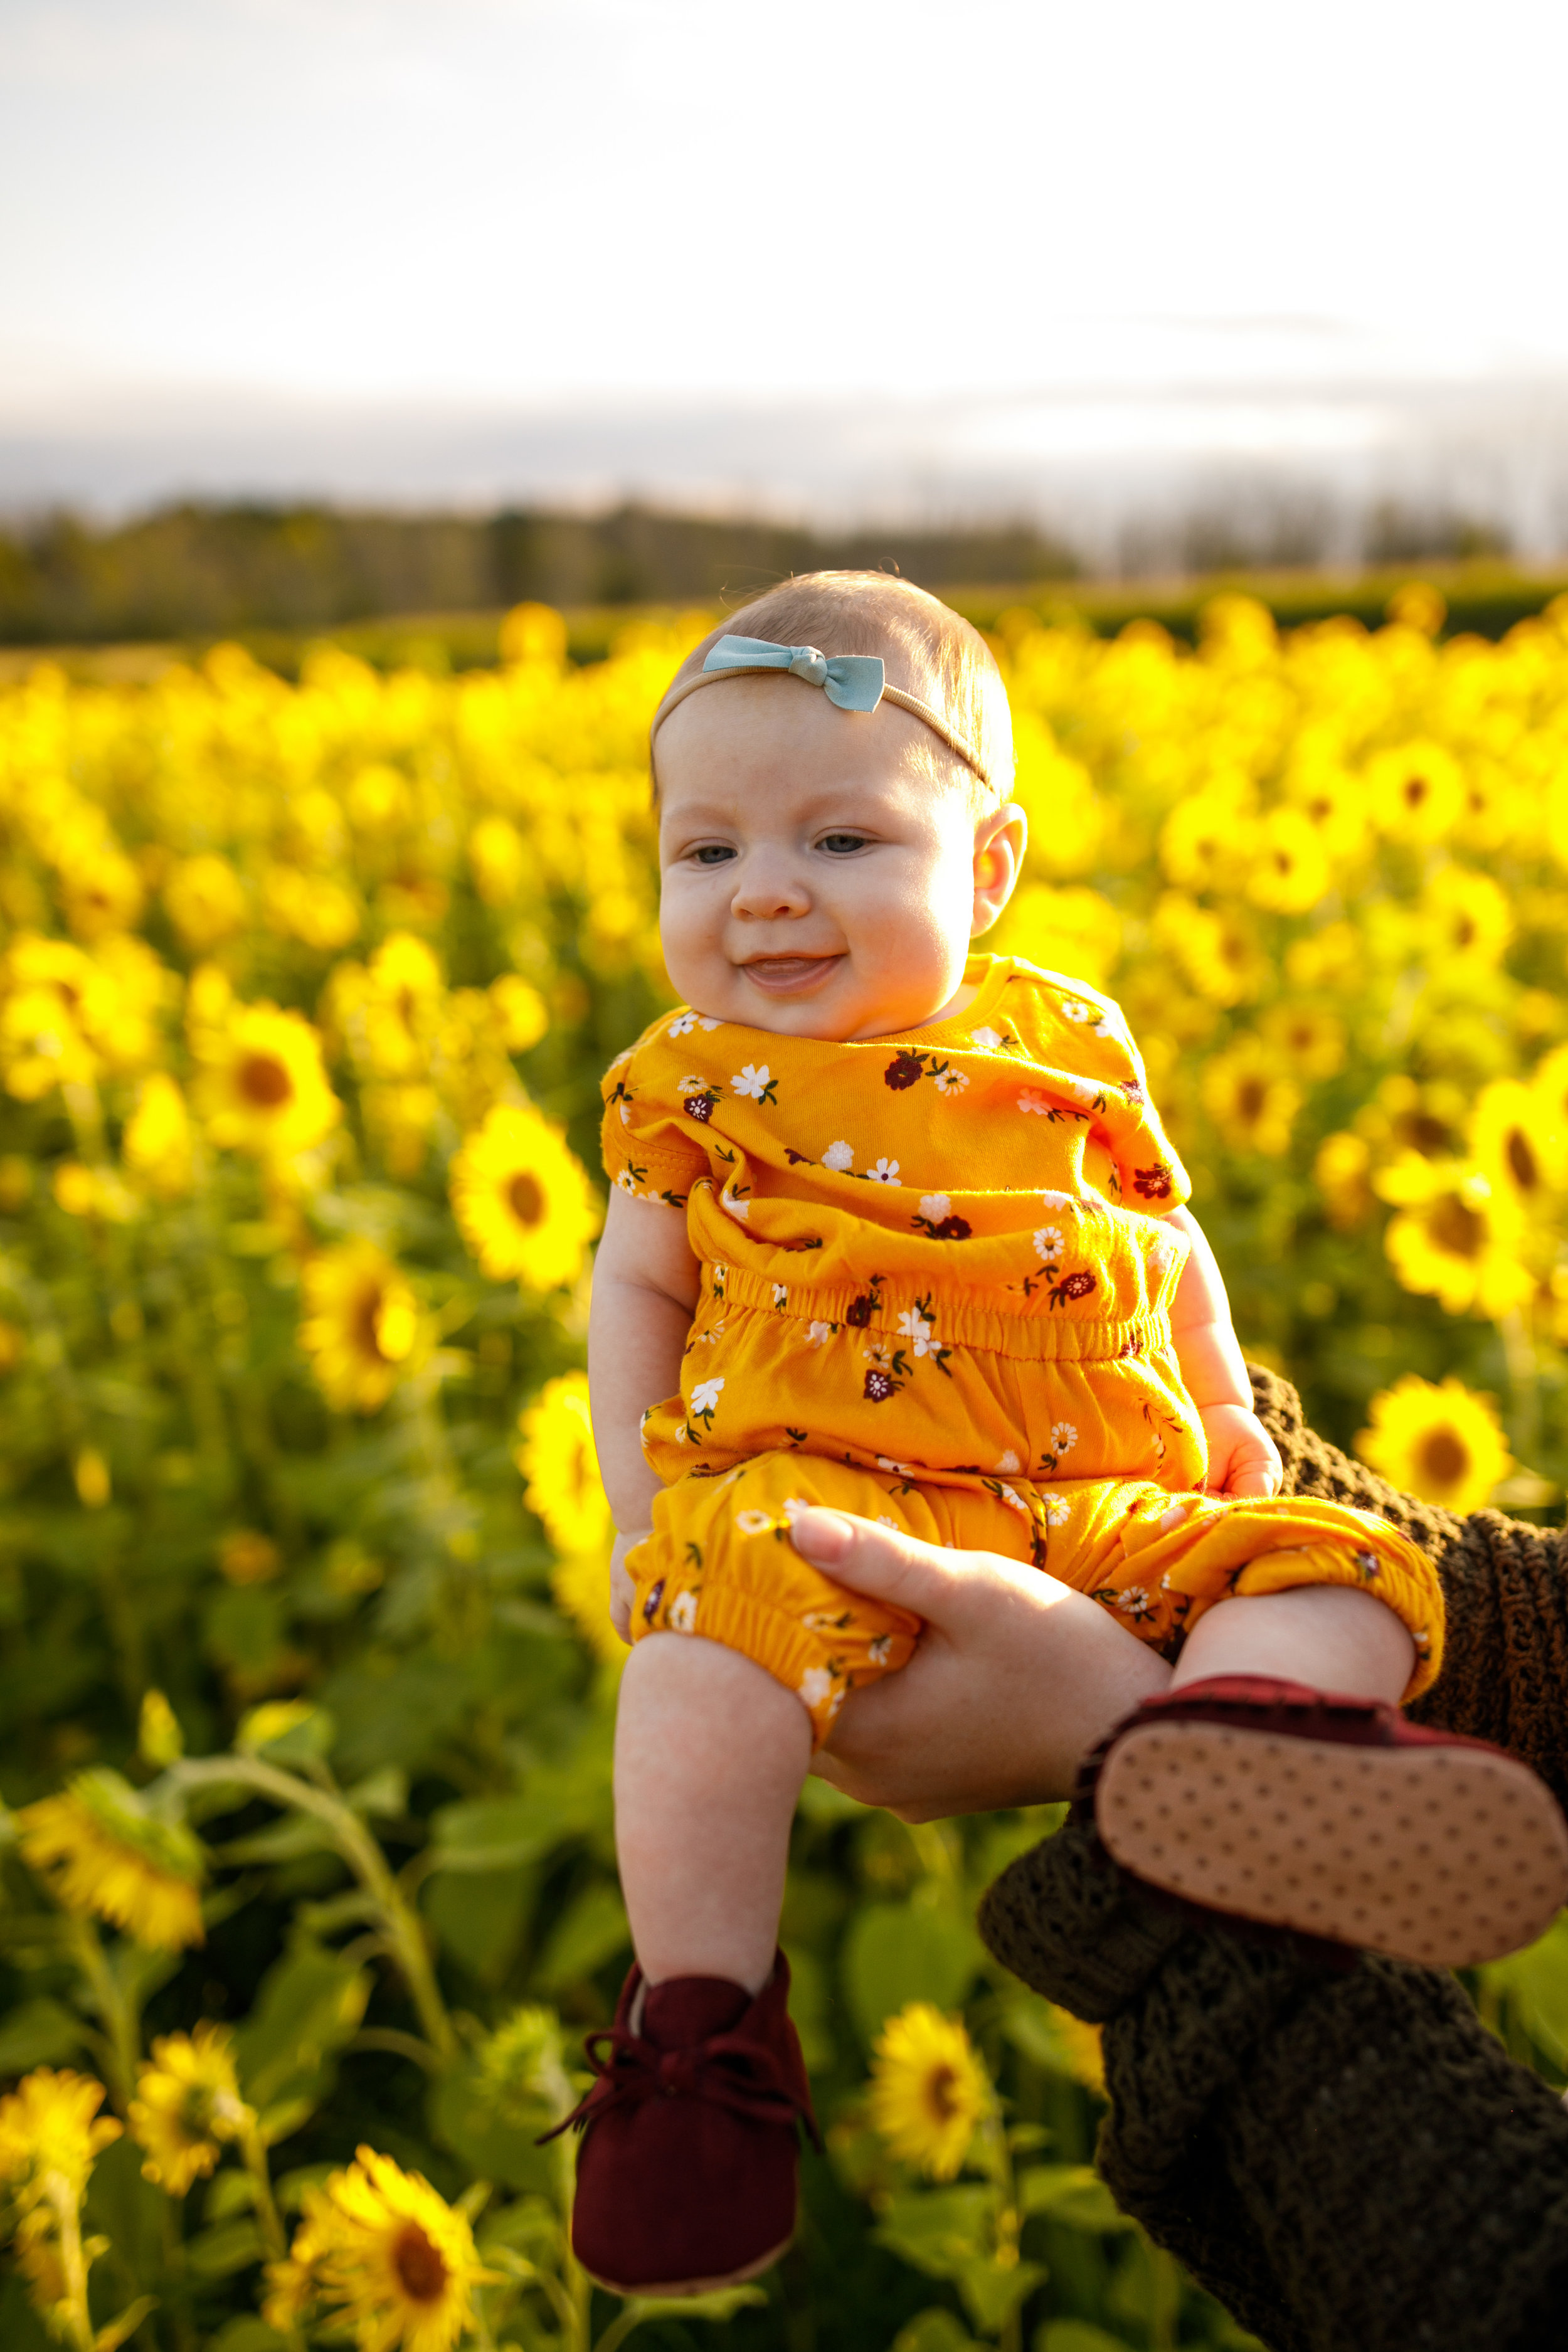 Morris Family Summer 2019 - Grand Rapids Photographer - Grand Rapids Family Photographer - Ed Dunneback and Girls - J Darling Photo 021.jpg